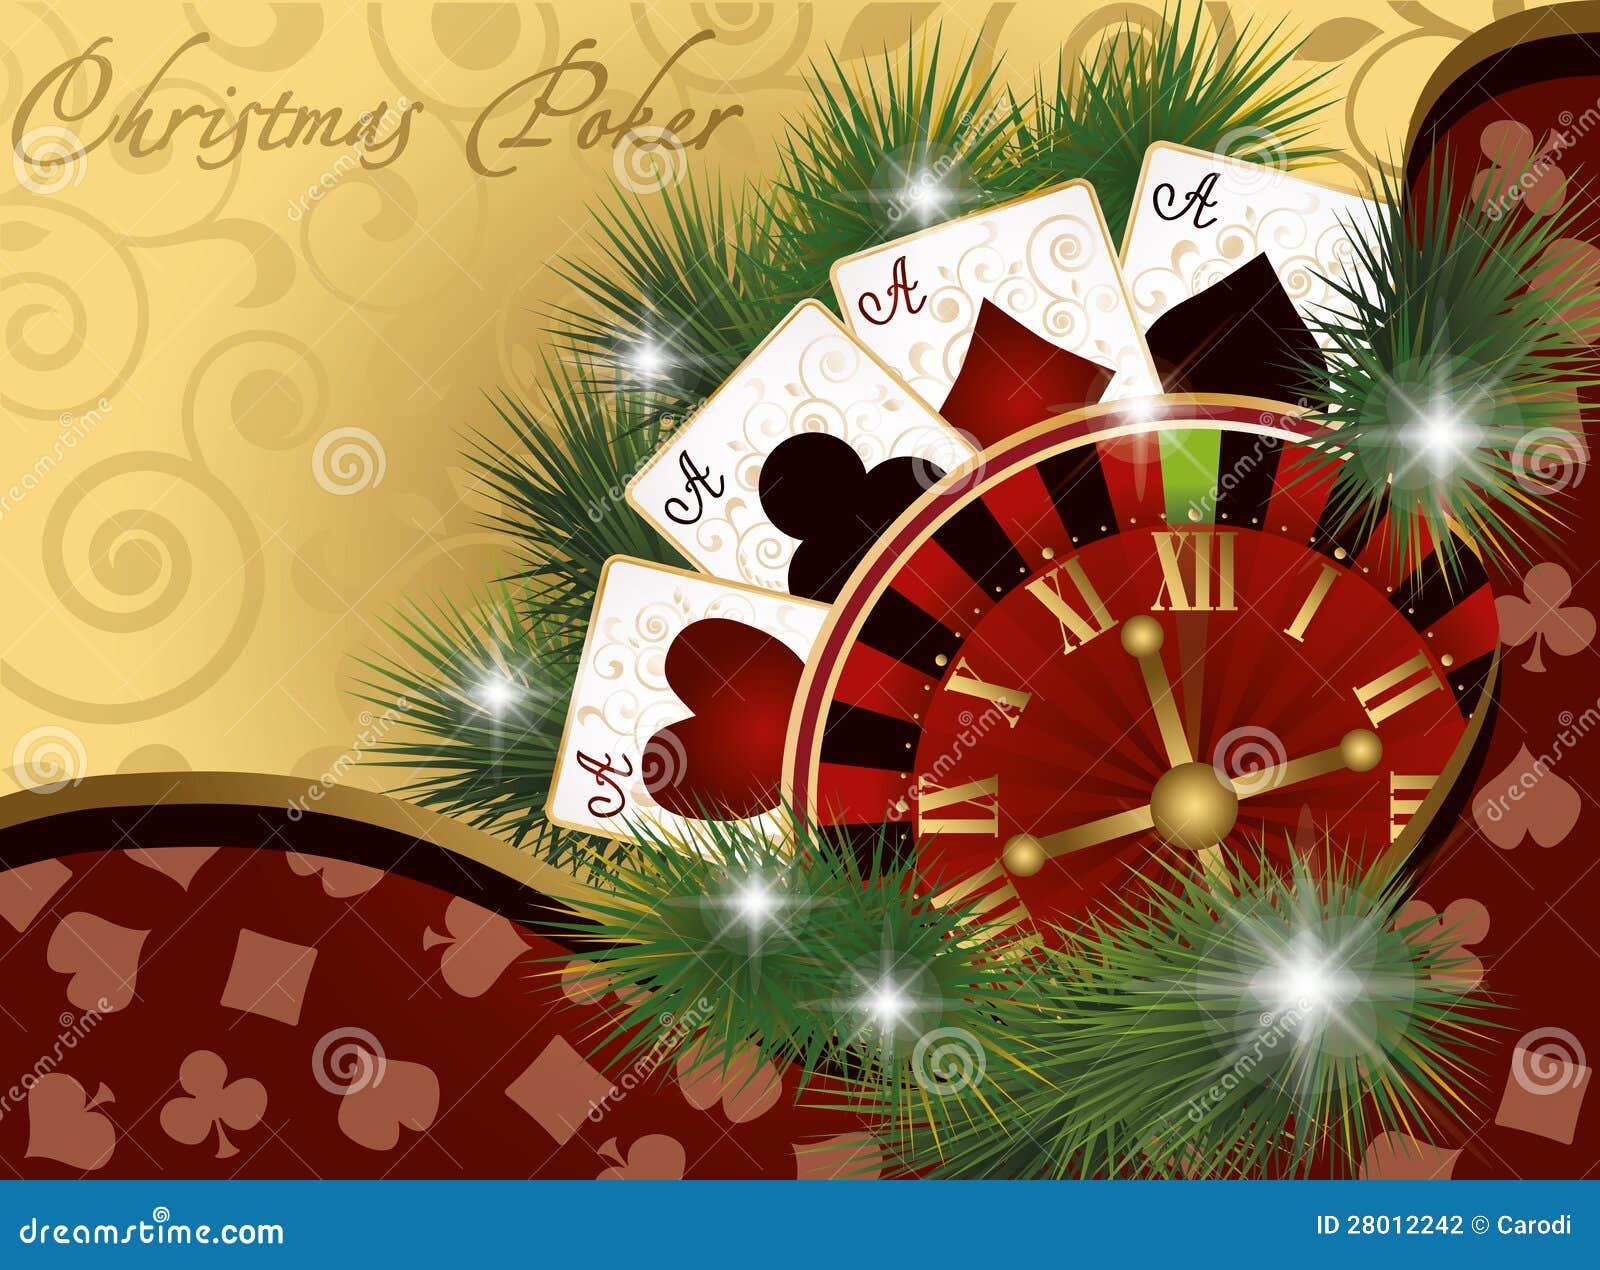 Christmas poker postcard stock vector. Image of background ...